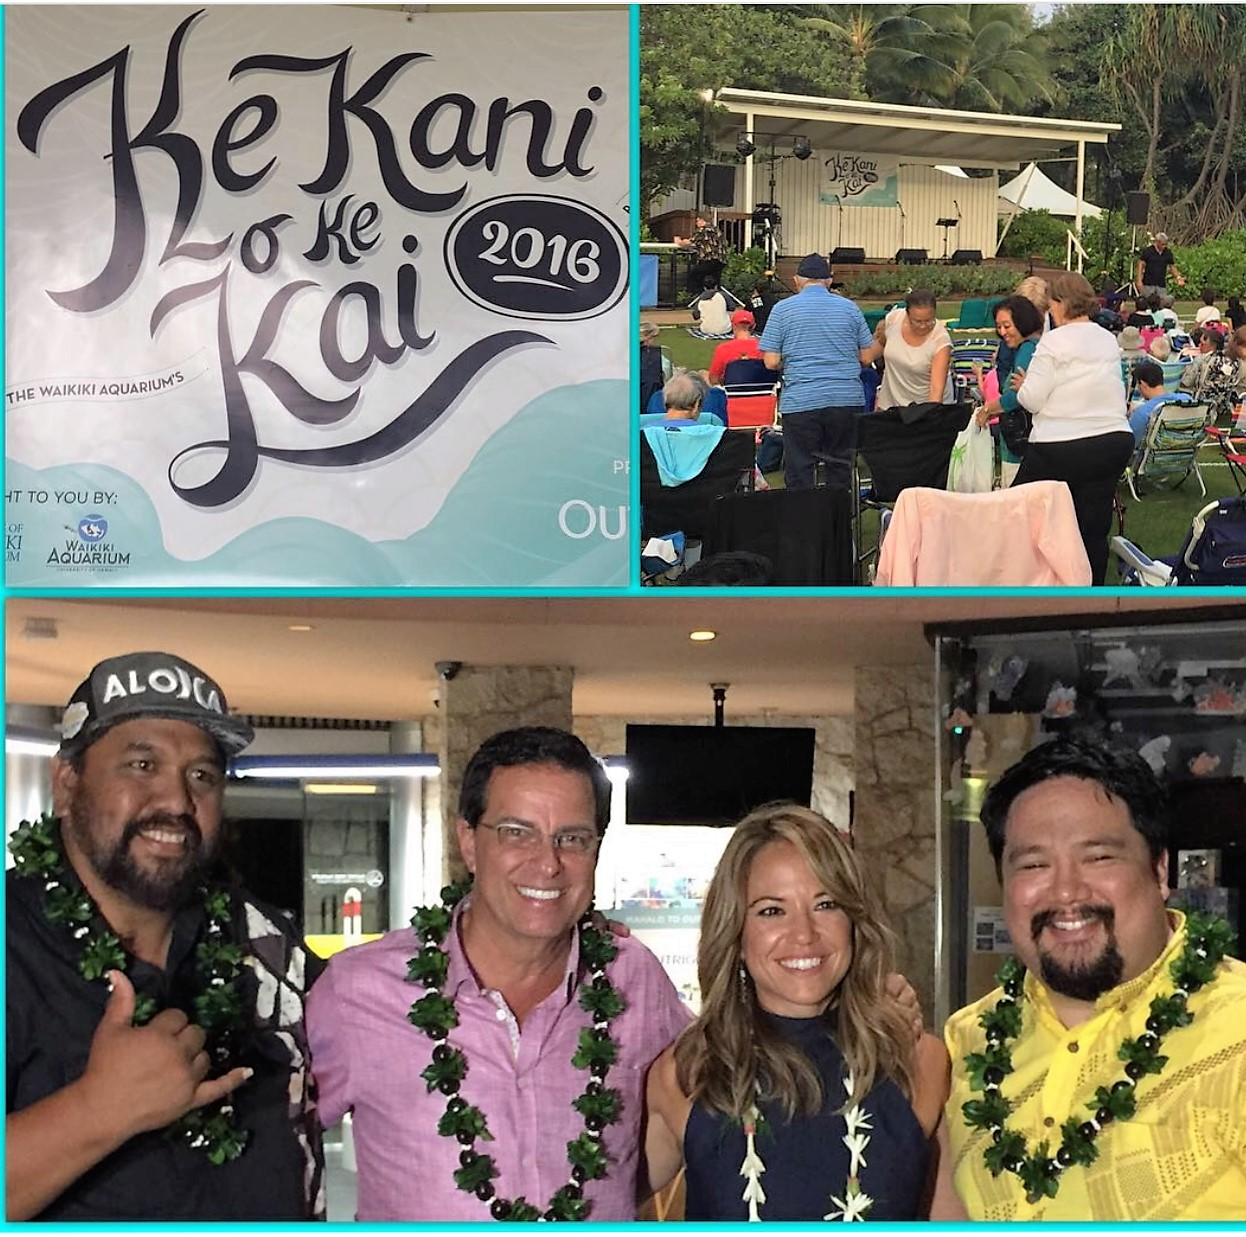 A great start the Waikiki Aquarium's Summer Concert Series with Kawika Kahialp, Ben & Maila and Chad Takatsugi!